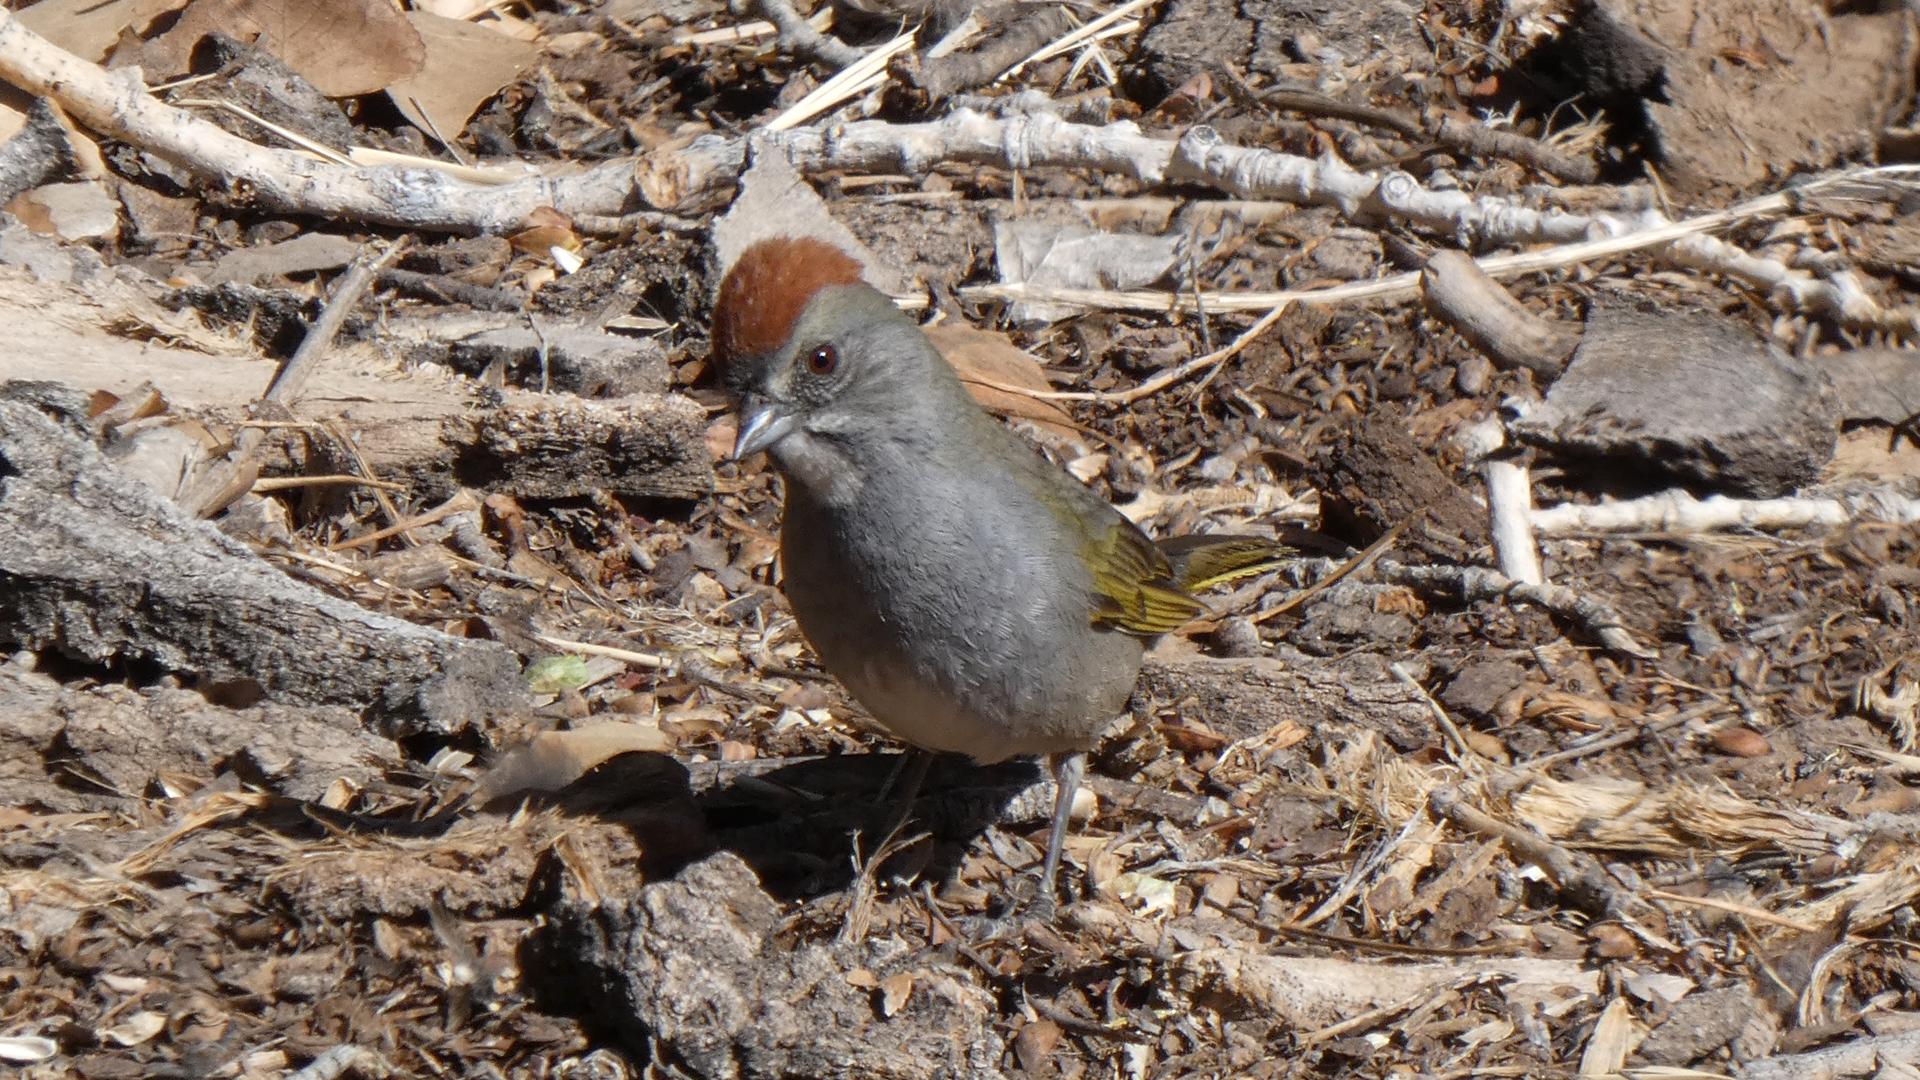 Adult, Rio Grande Nature Center, April 2021